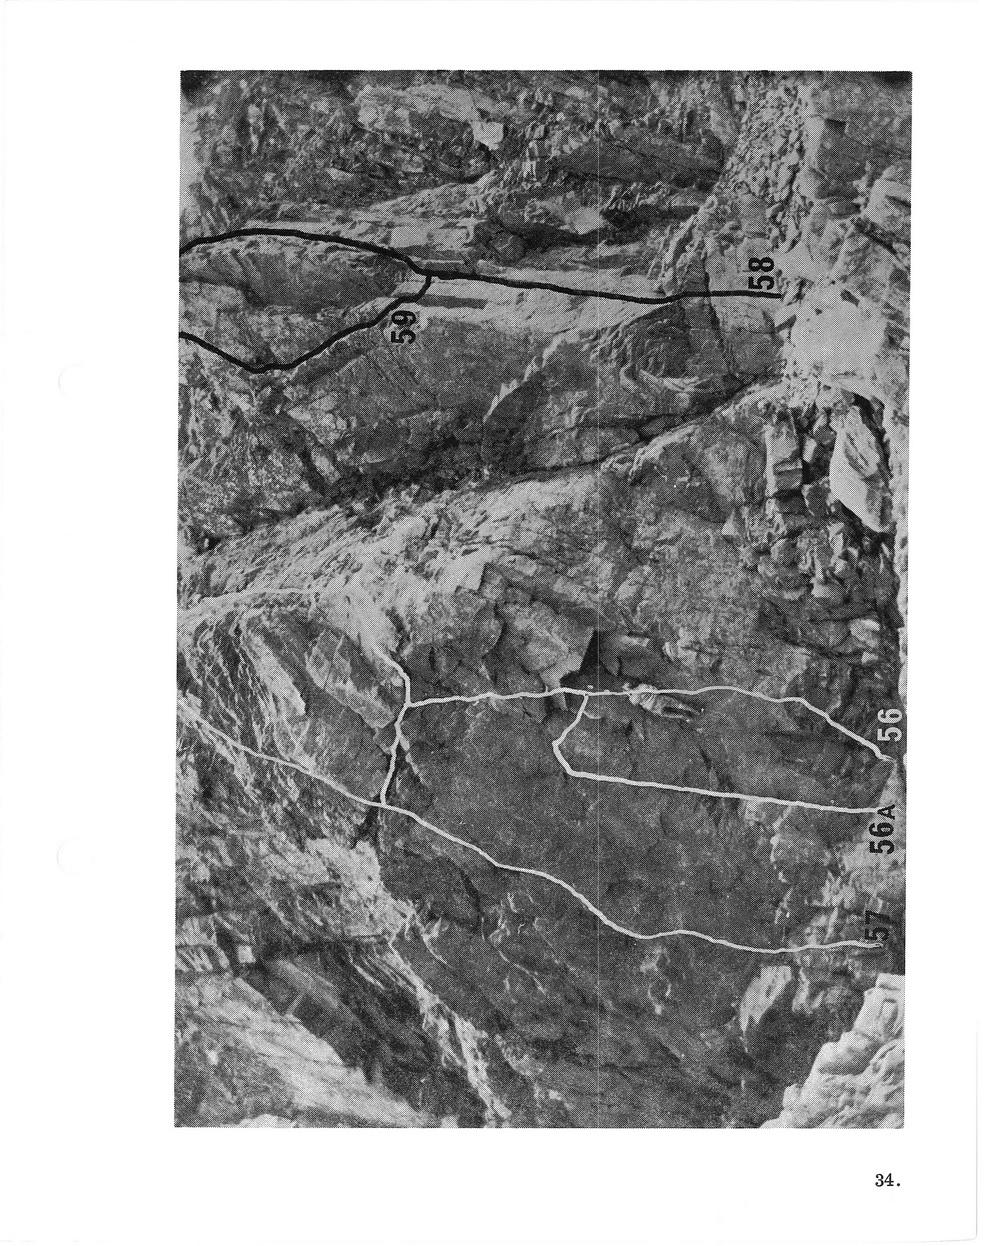 Kullen guide 1972 034.jpg